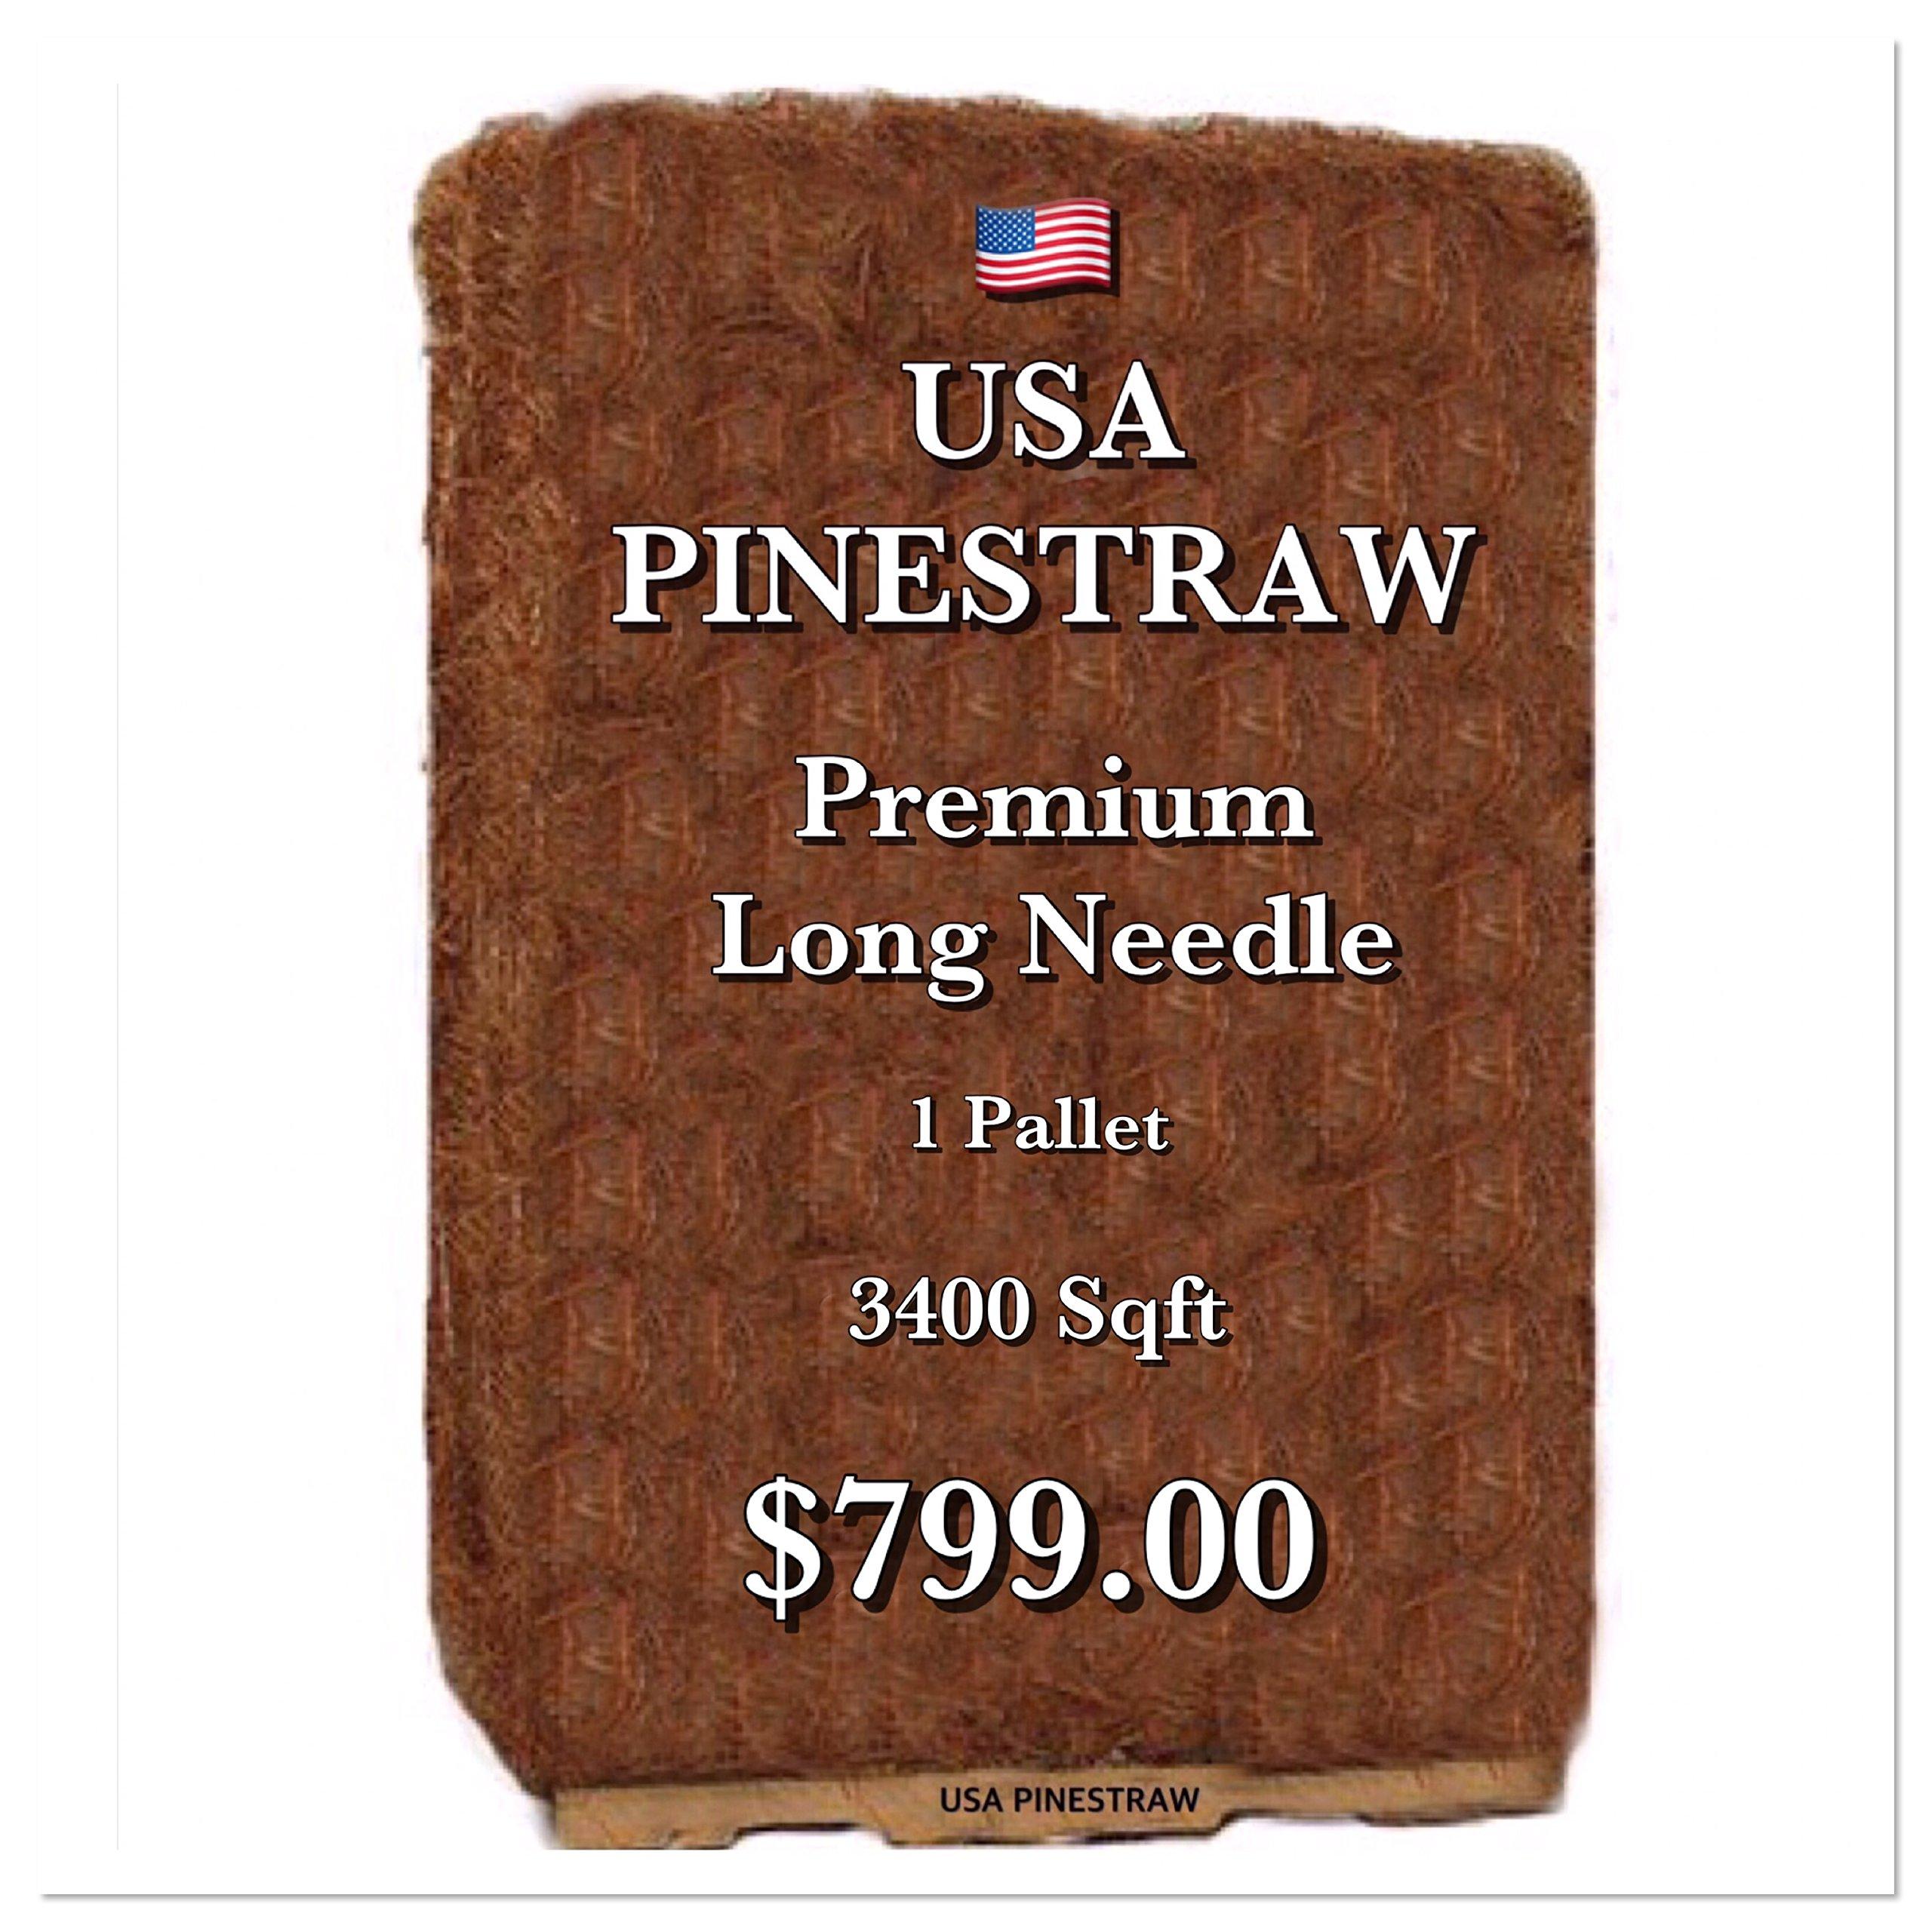 USA Pine Straw - Pine Needle Mulch - Premium Long Needle - Covers 3400 Sqft